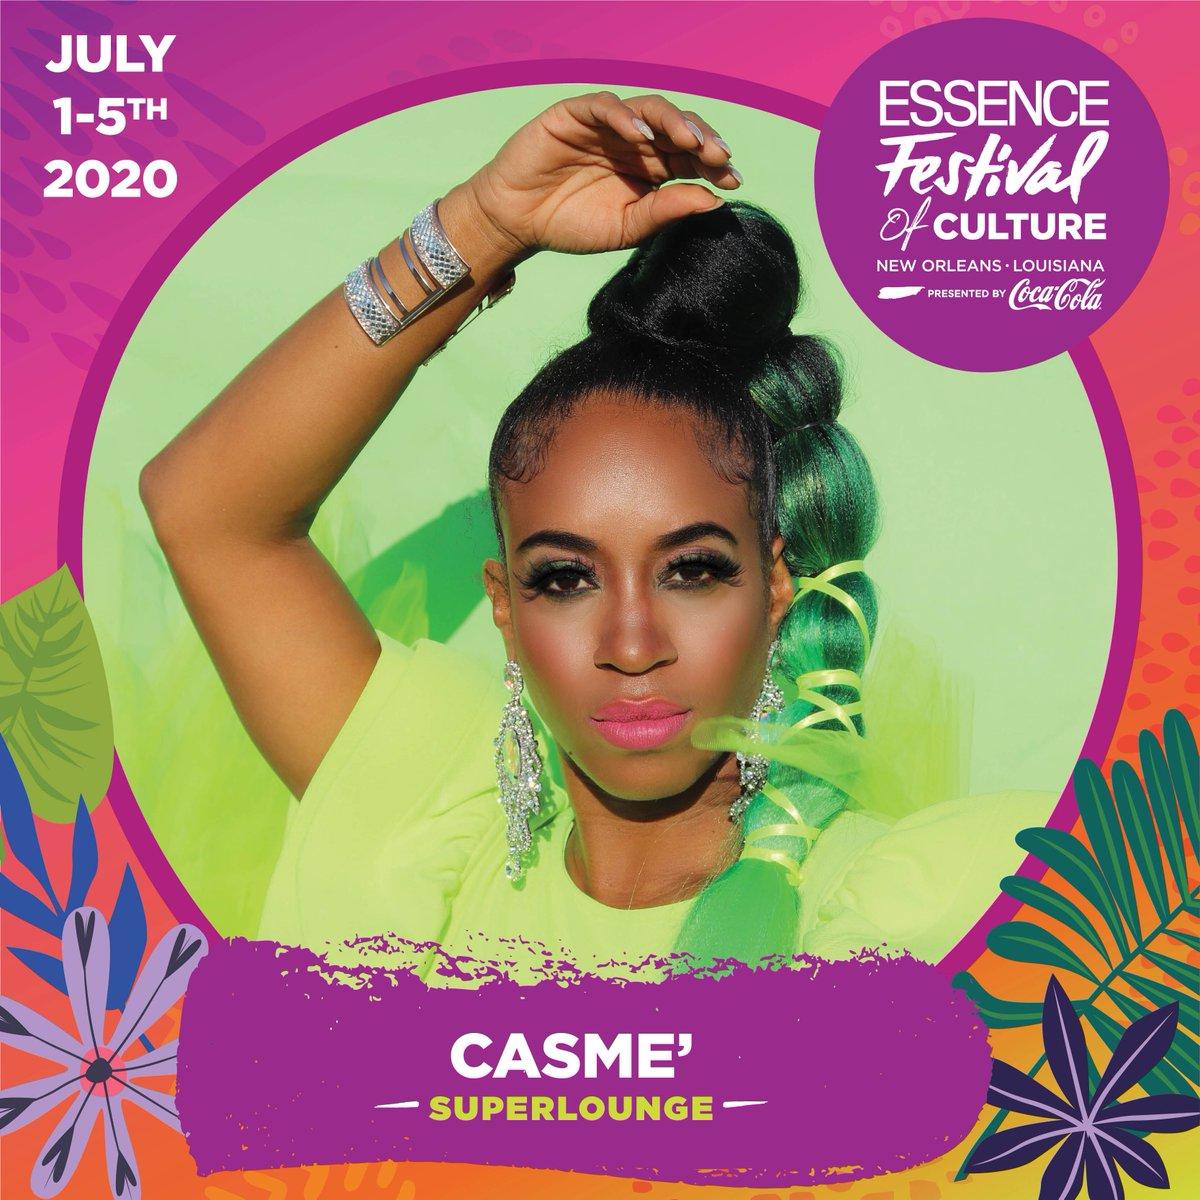 RT @IAMCASME: #essencefest @essencefest https://t.co/IUuzZkCDOf